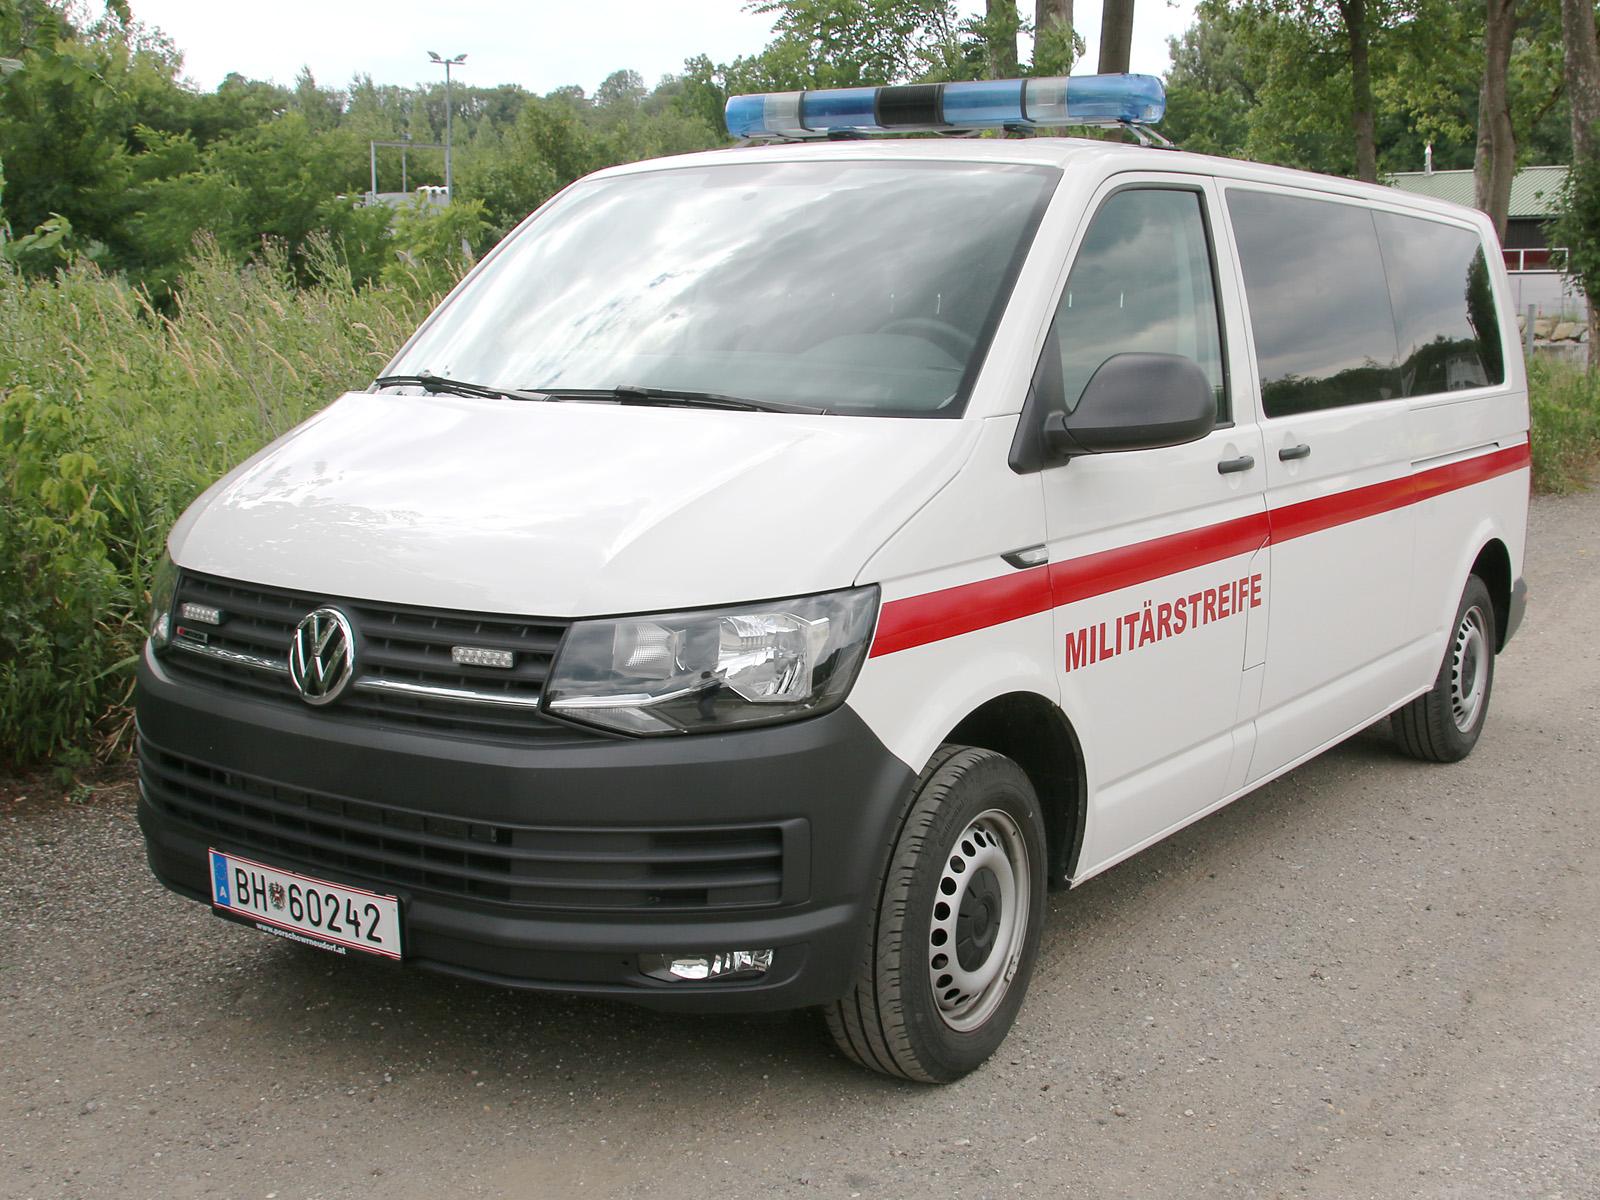 VW Transporter T6 4motion der Militärstreife / Militärpolizei © Doppeladler.com